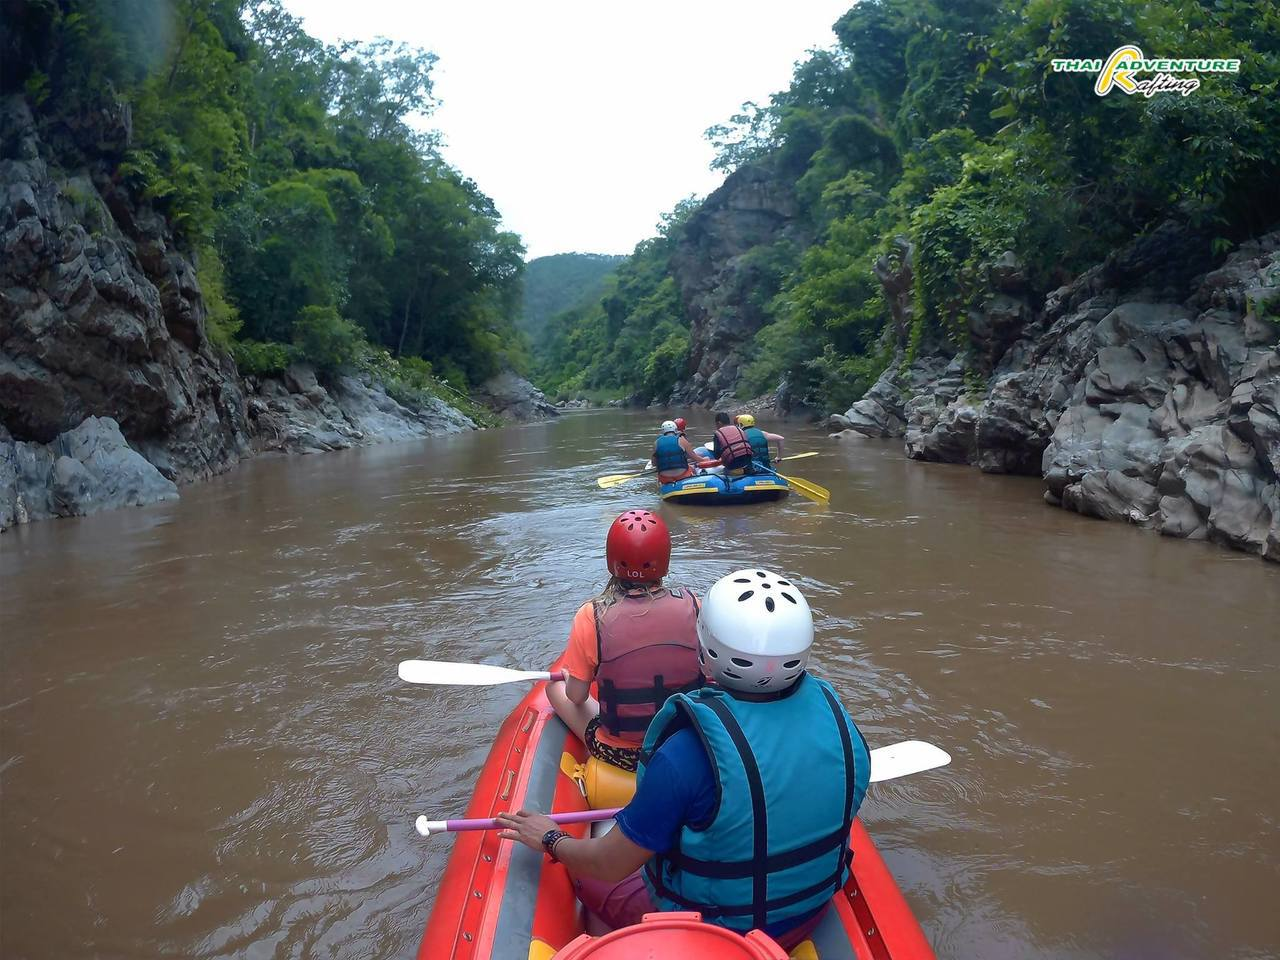 擺河激流泛舟。圖/翻攝自Thai Adventure Rafting臉書專頁